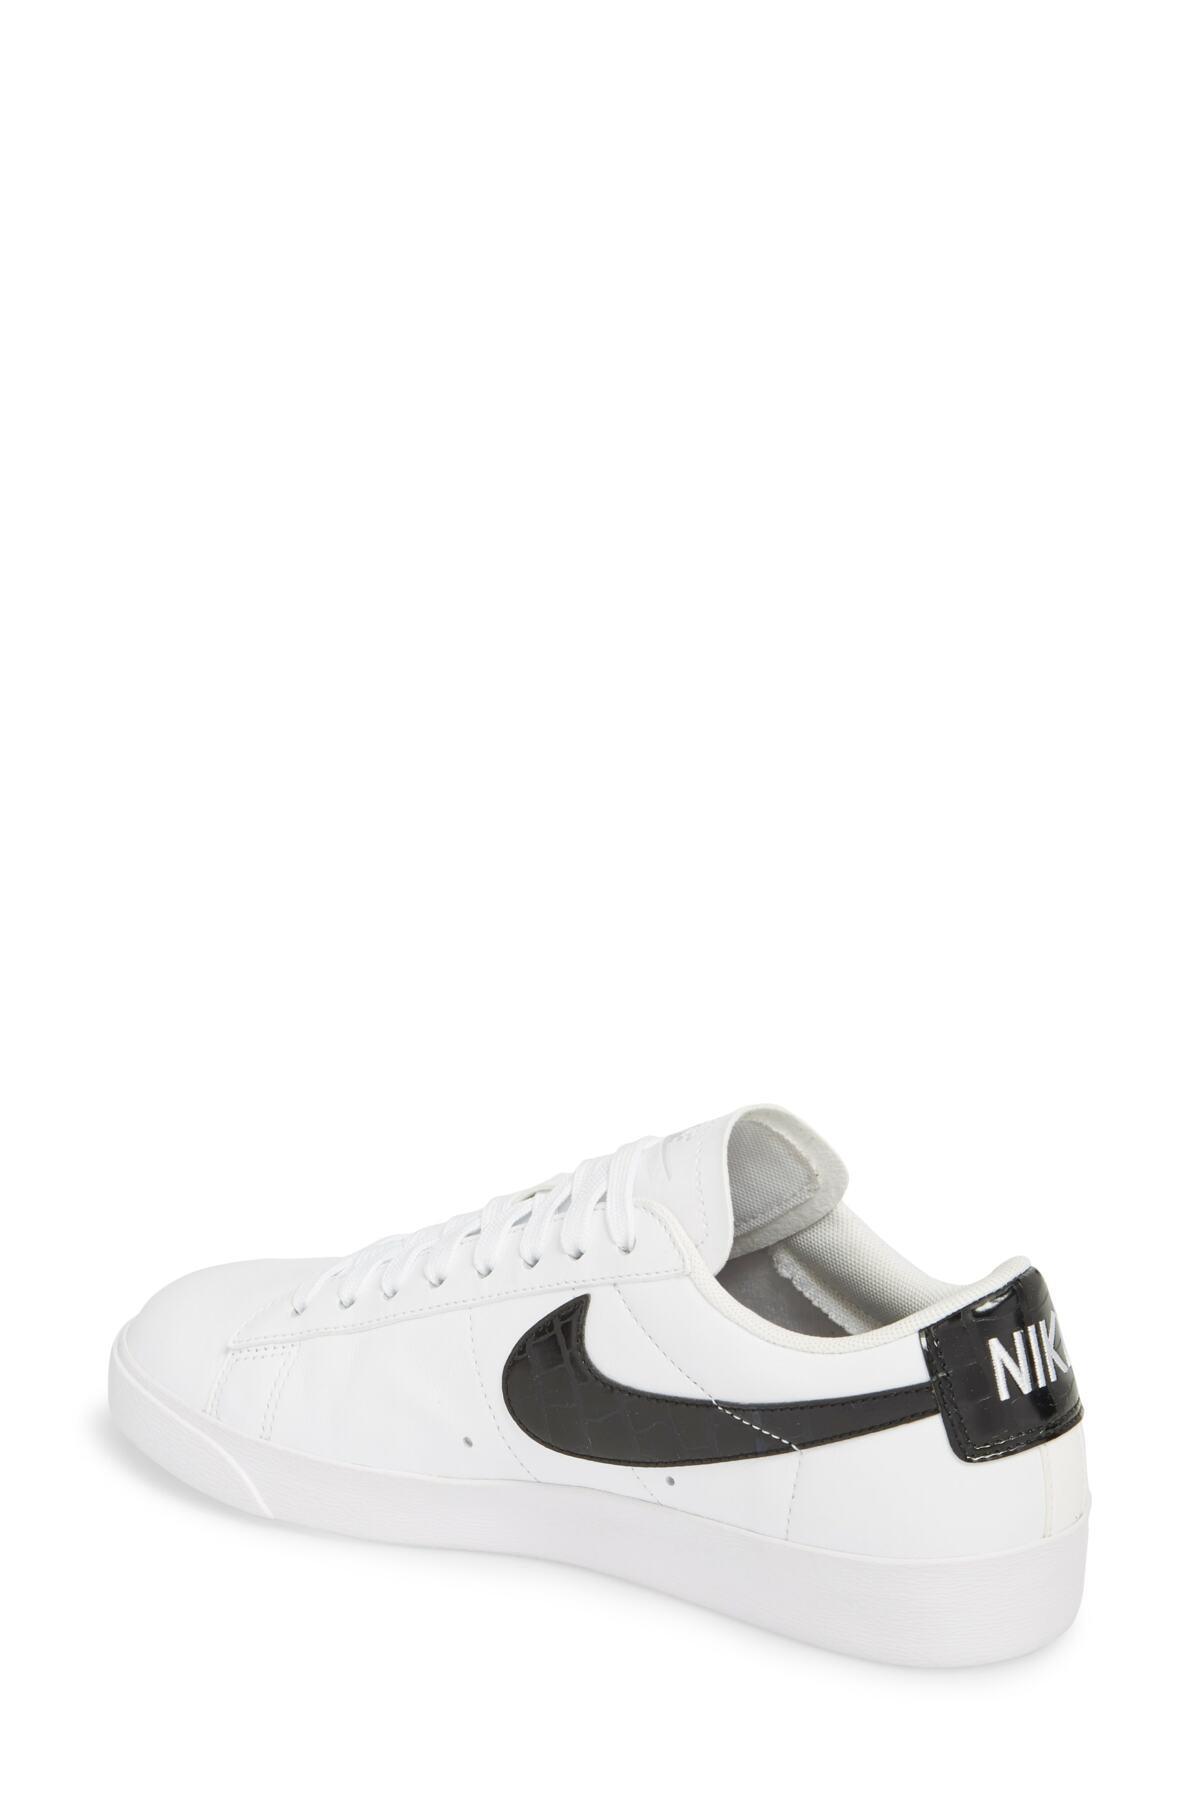 promo code ab258 2168d Nike White Blazer Low Essential Sneaker